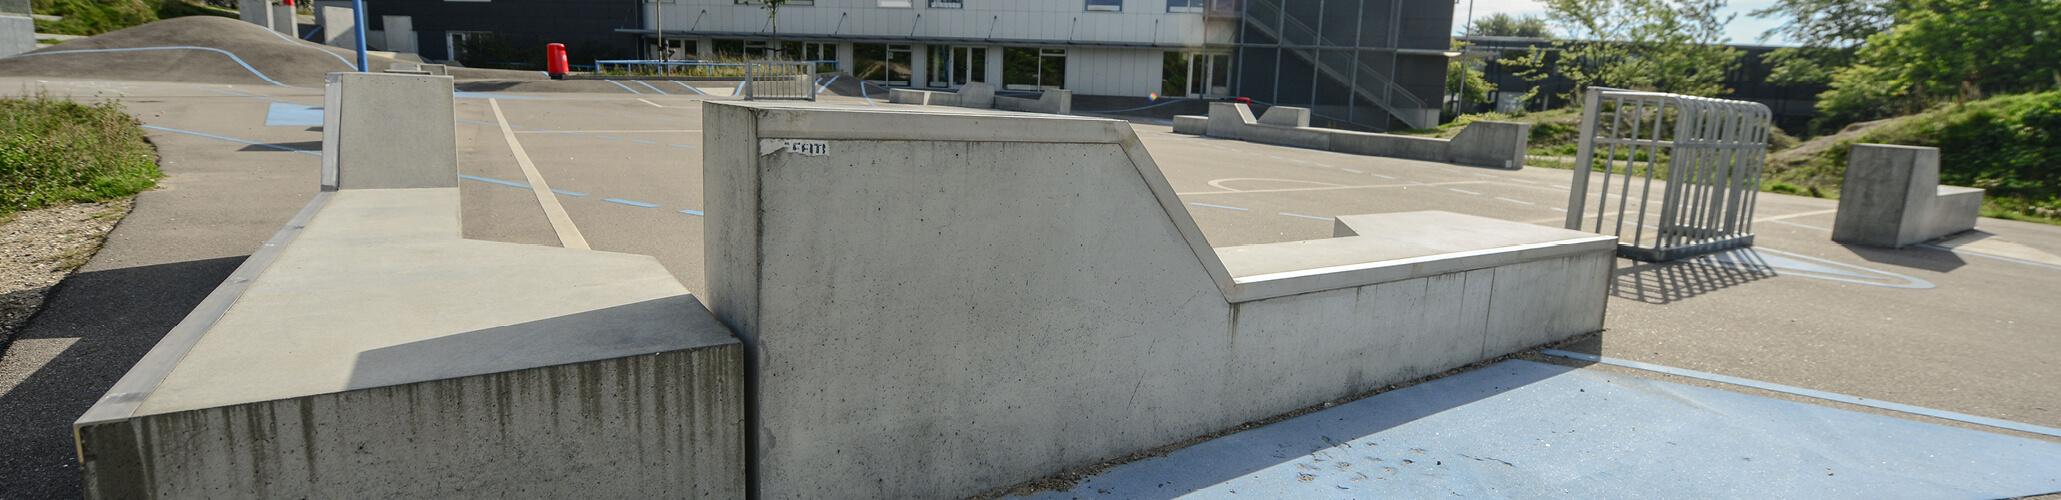 Slider_nederst_stoettemure_aarhus_cementvarefabrik